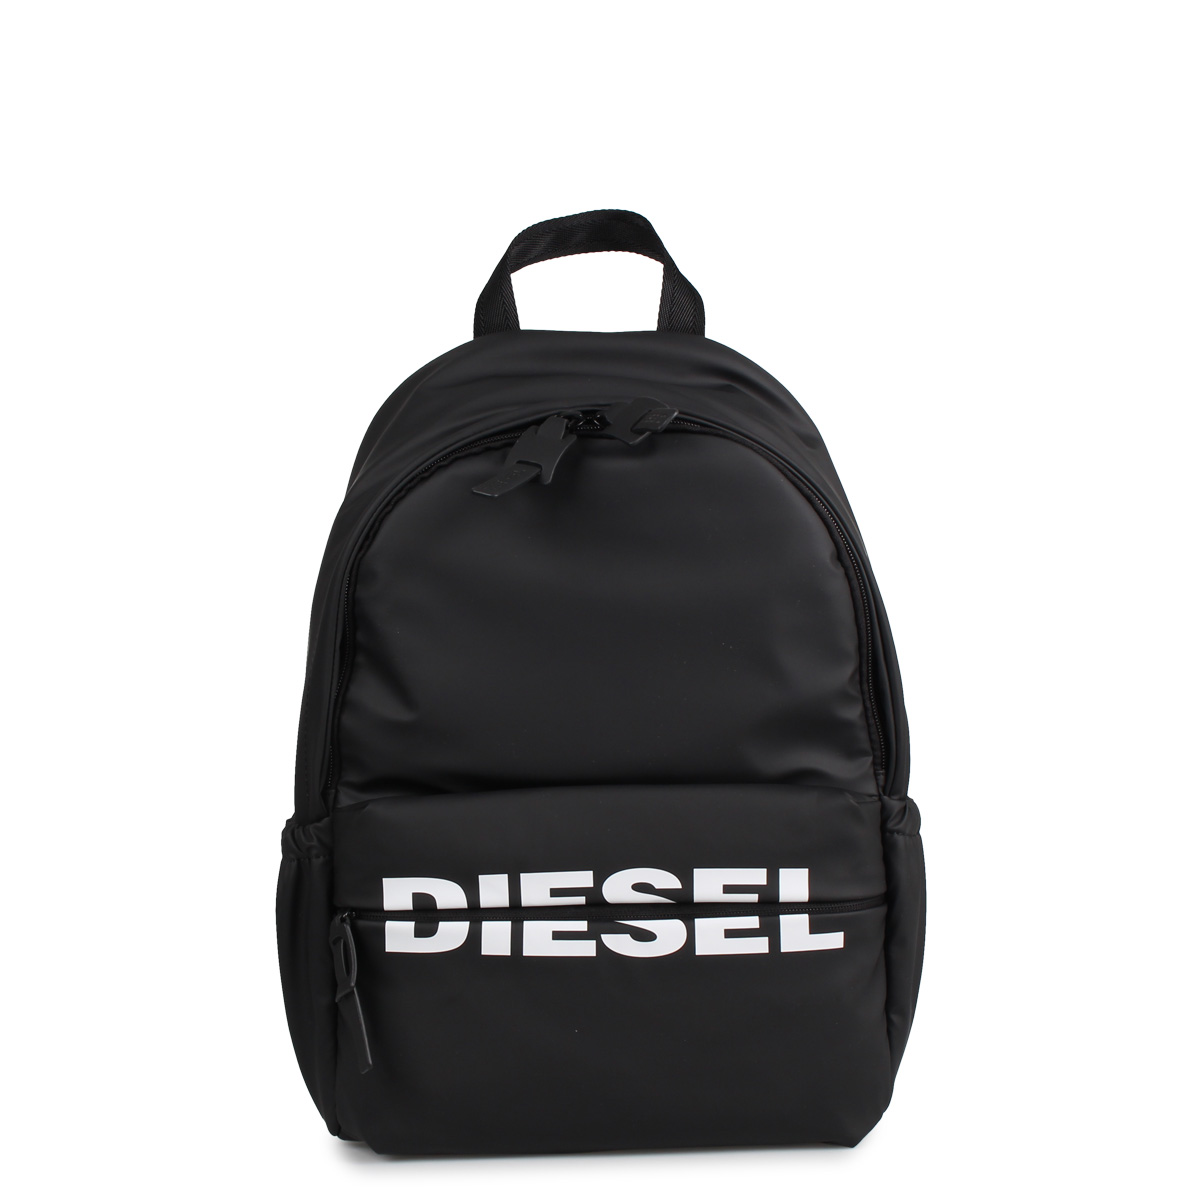 DIESEL BOLDMESSAGE F-BOLD BACK II ディーゼル リュック バッグ バックパック レディース ブラック 黒 X06285-P1705